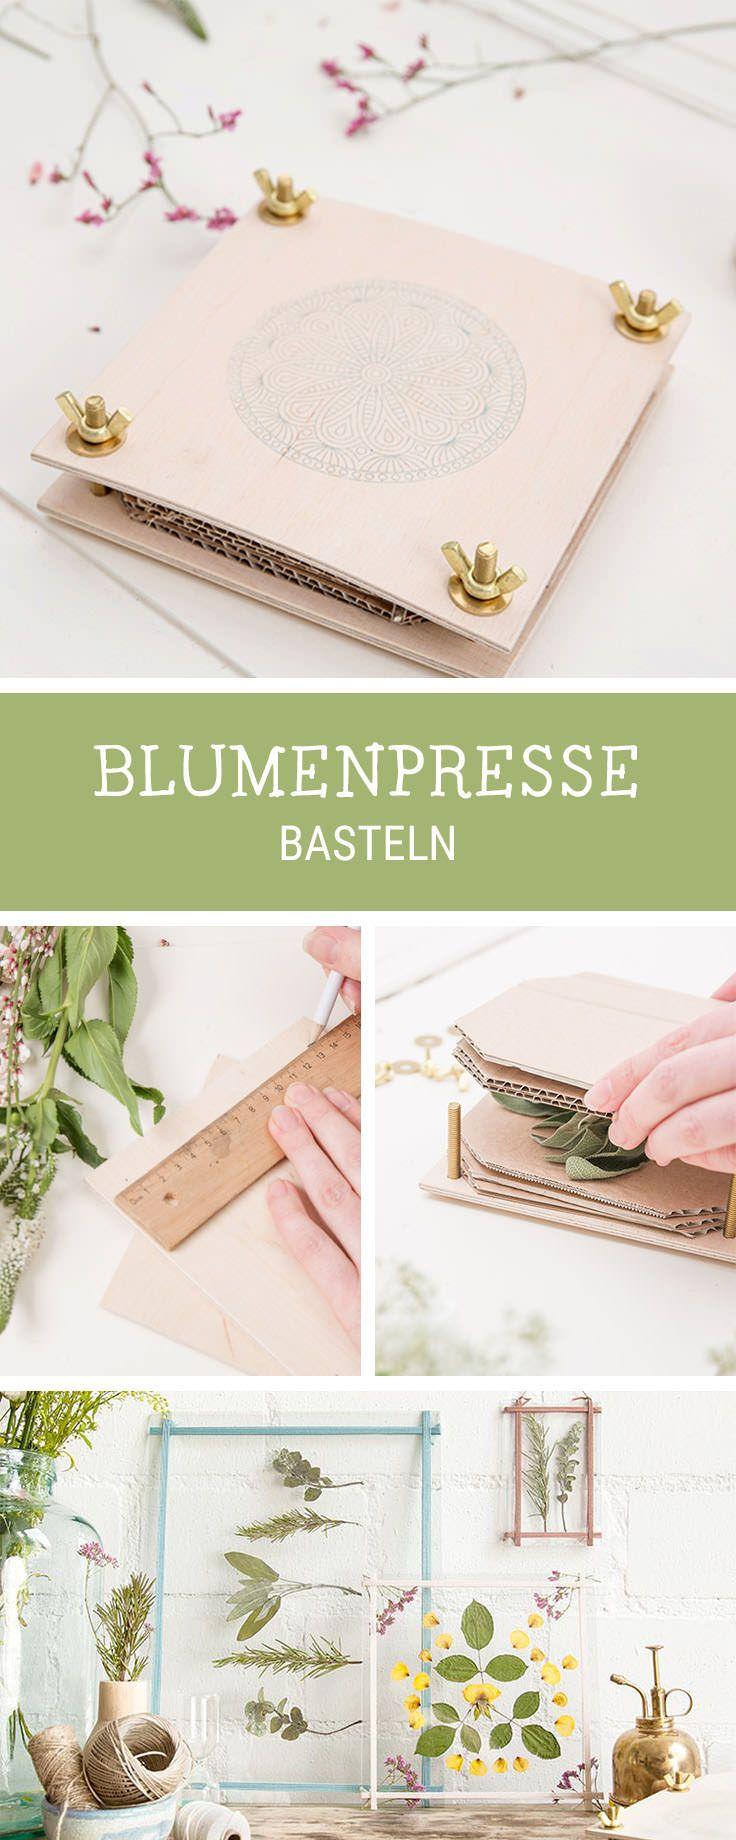 DIY-Anleitung für eine selbstgebaute Blumenpresse / crafting a flower press, botanical diys via DaWanda.com